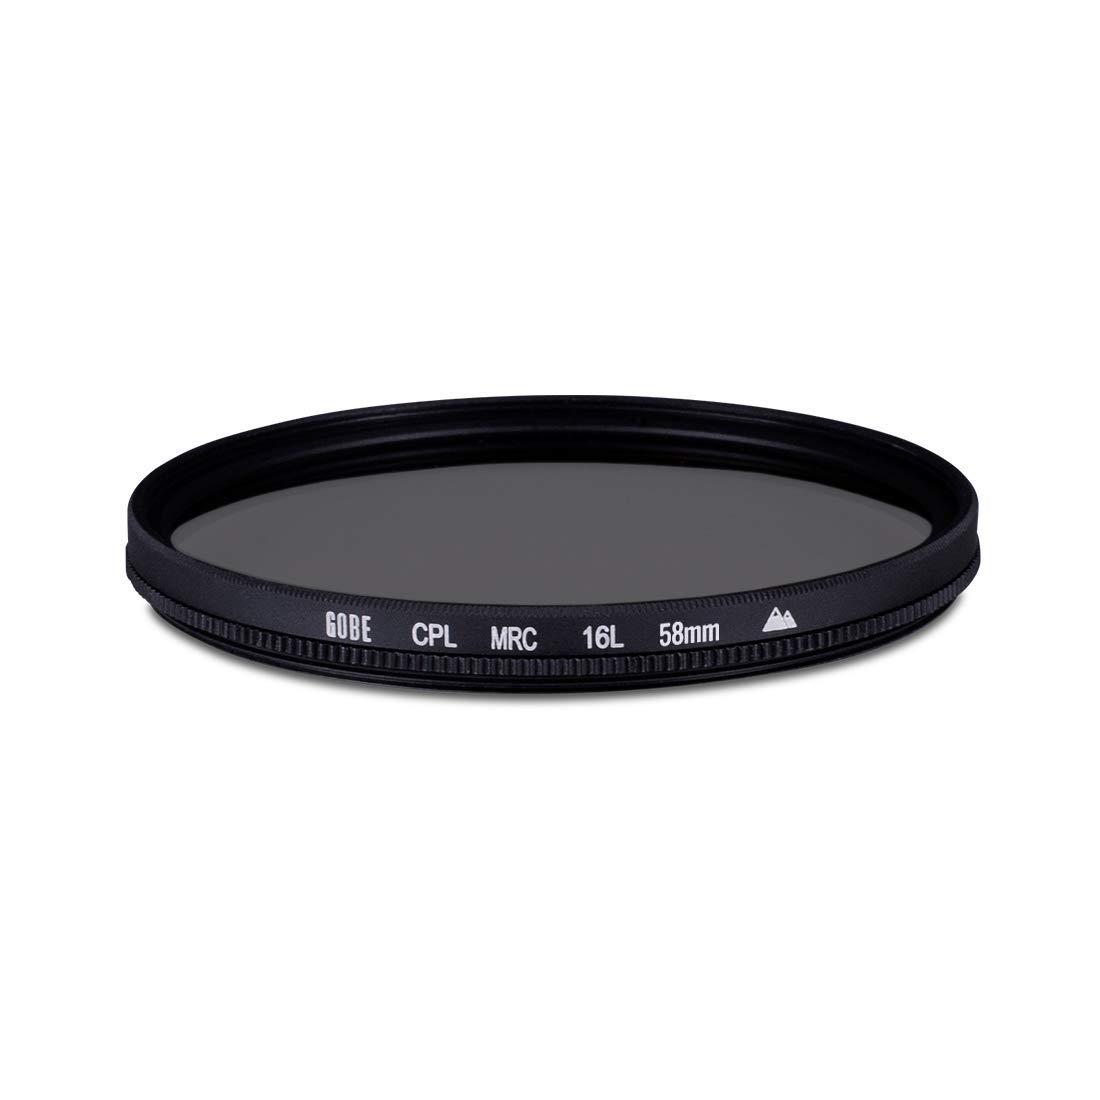 Gobe - Filtro para Objetivo de Polarizado Circular (CPL) 58 mm (2Peak)